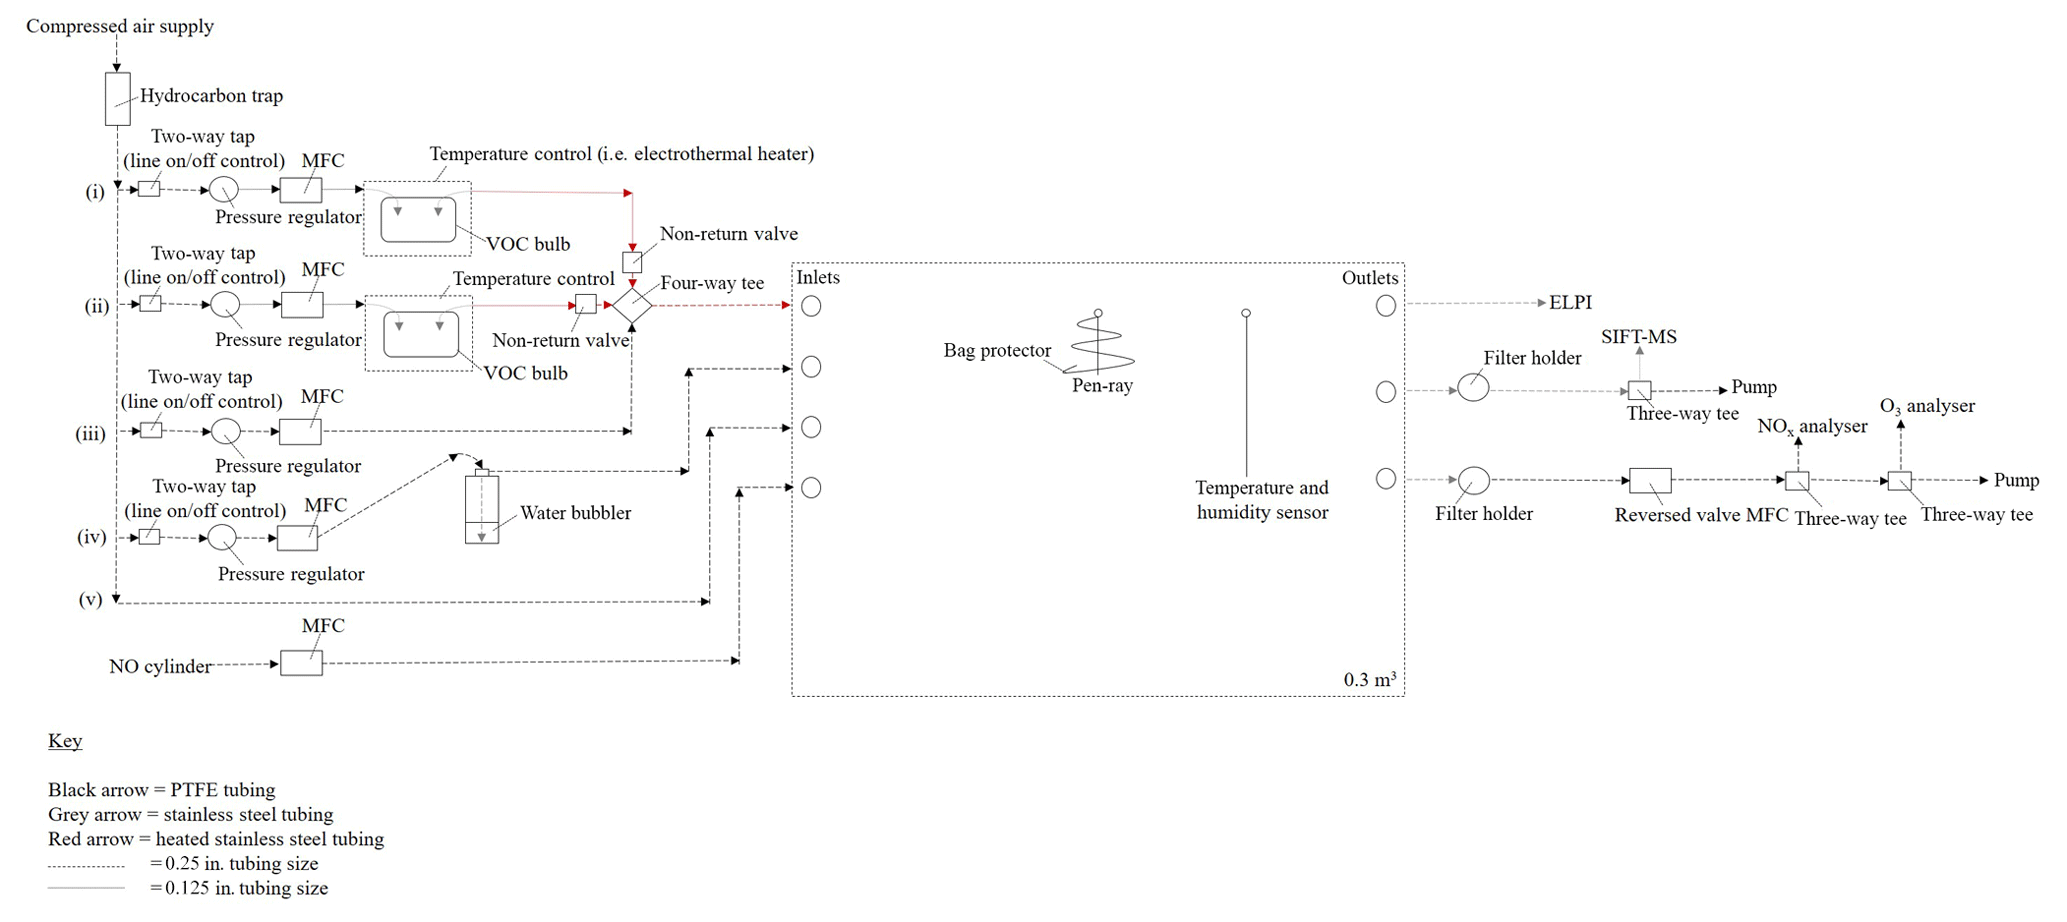 AMT - A new aerosol flow reactor to study secondary organic